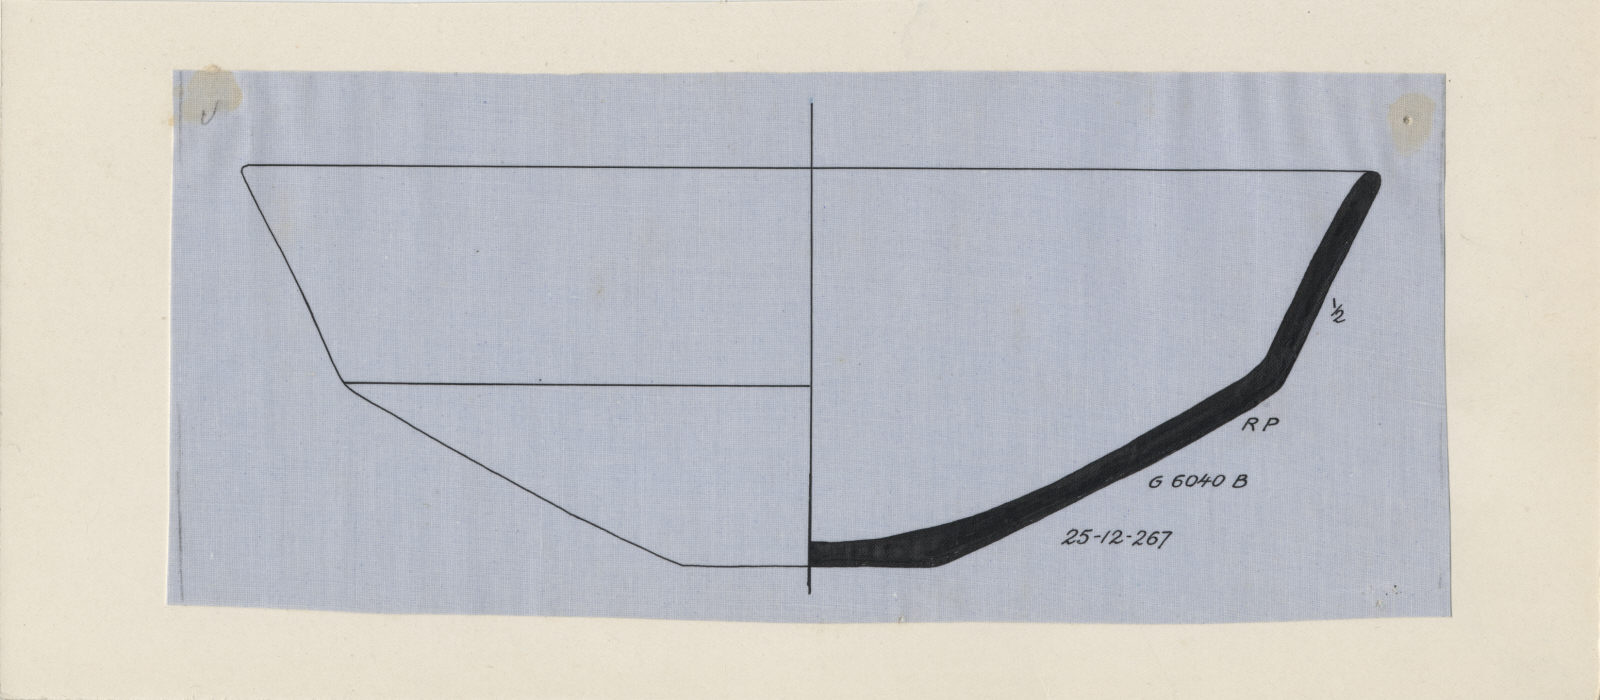 Drawings: G 6040, Shaft B: pottery, carinated bowl